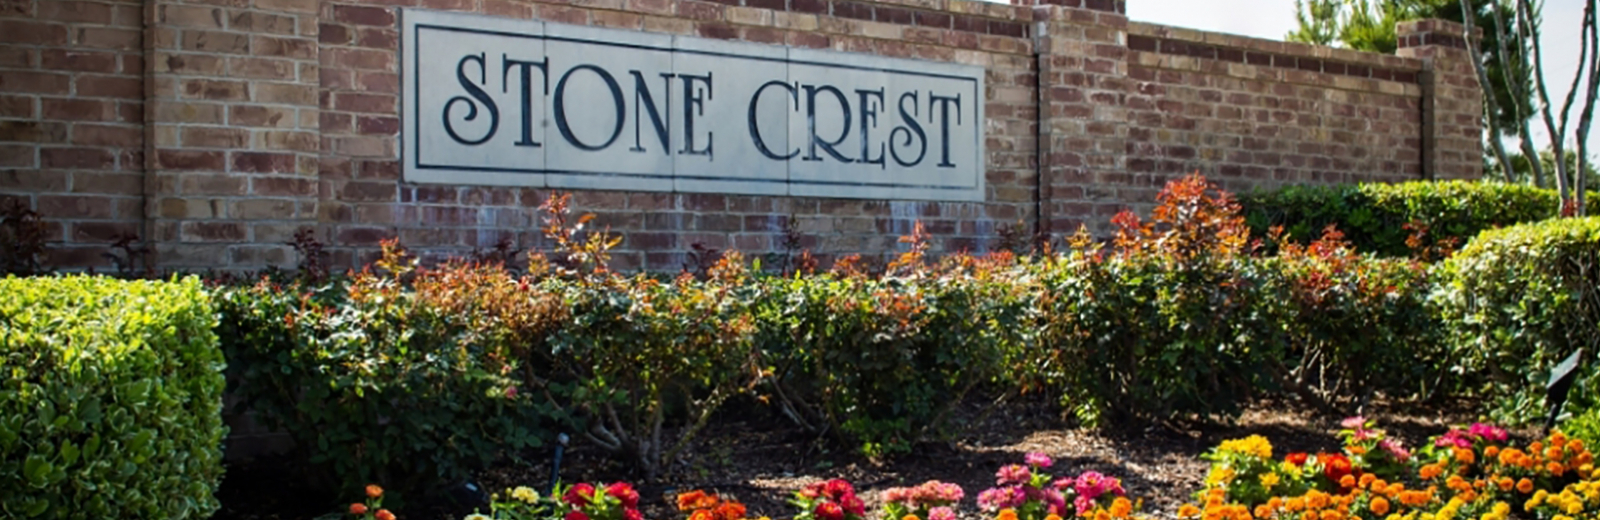 Stone Crest